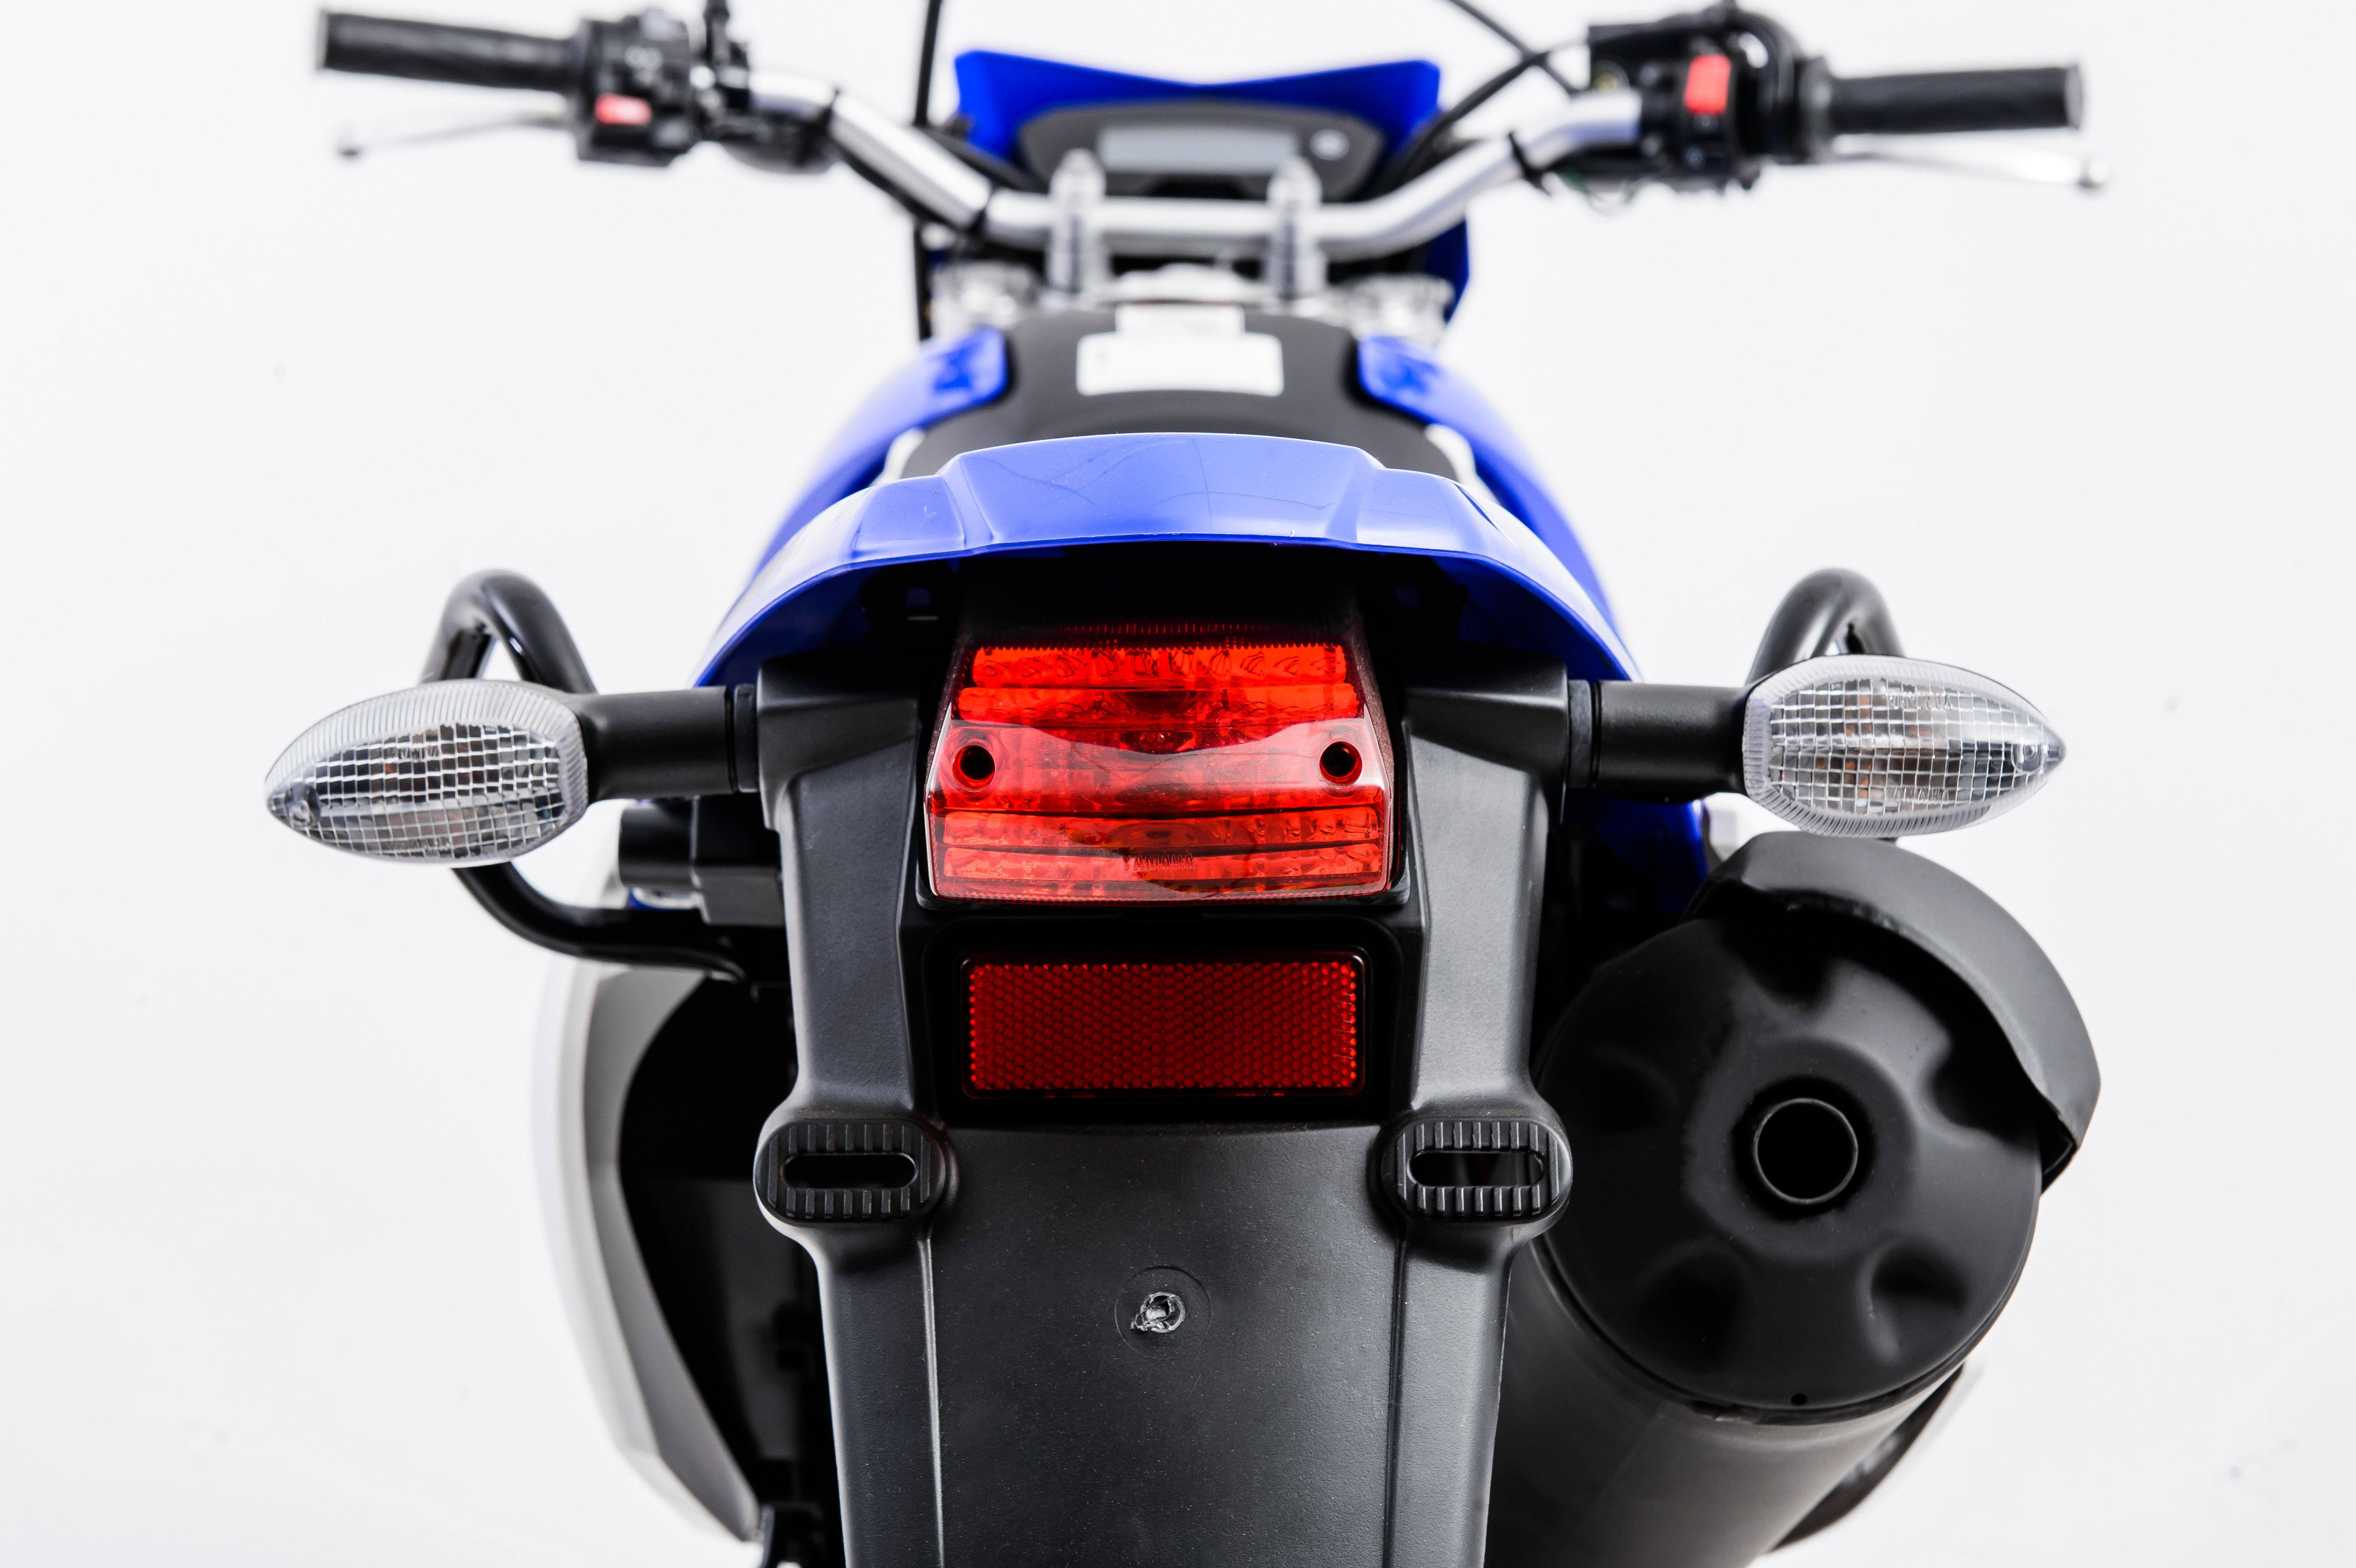 Top 10 250cc Motorcycles furthermore Suzuki gsxr600 2006 likewise XTZ 250 Lander Blueflex 2016 together with 845 Kawasaki Ninja 300 Wallpaper Wallpaper 1 additionally Gallery php. on 2010 kawasaki ninja 250r